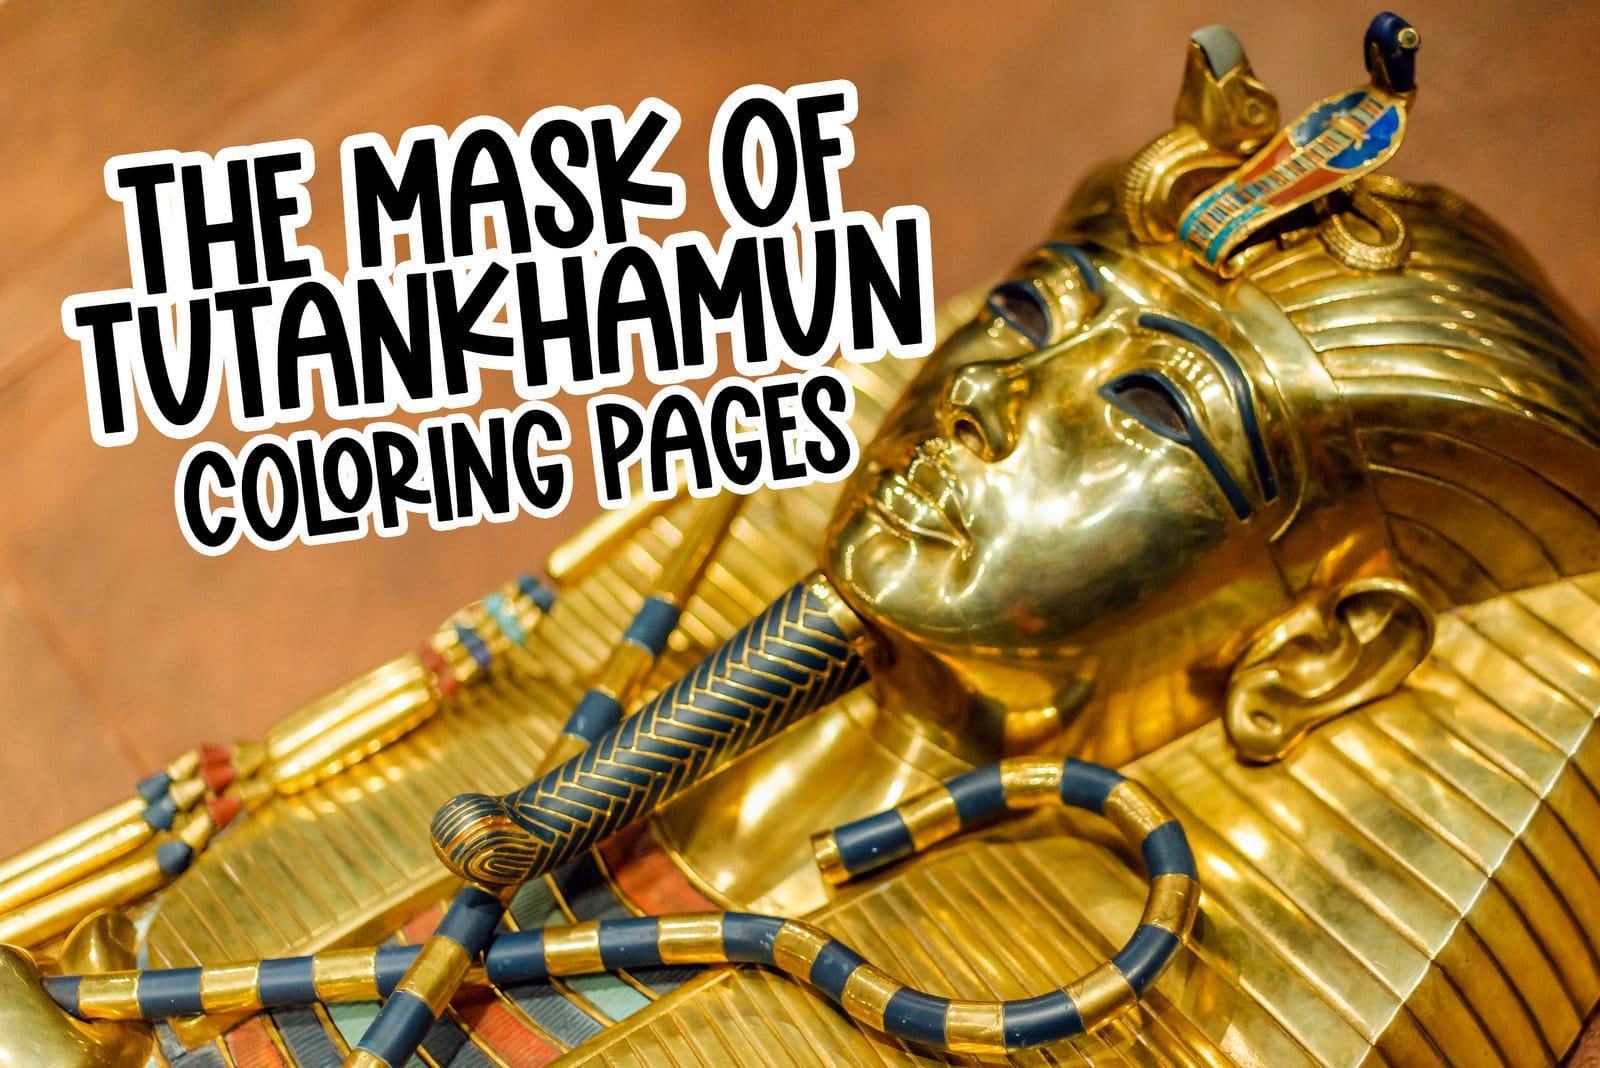 Mask of Tutankhamun coloring pages